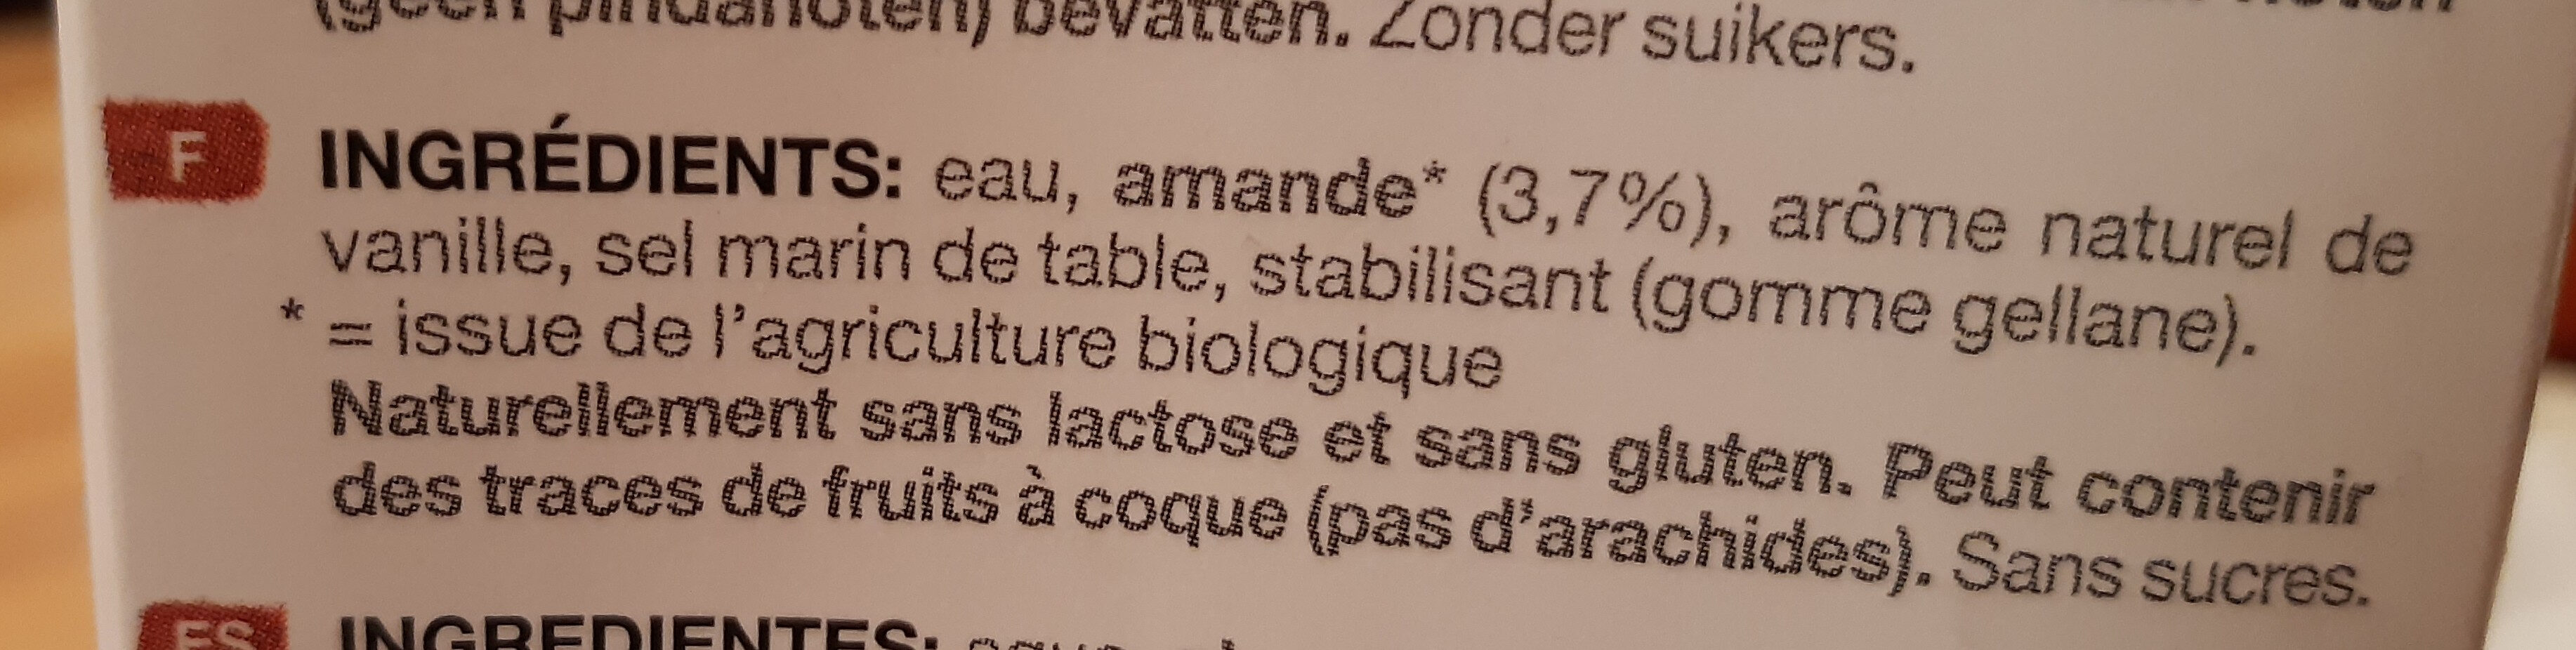 Provamel Almond - Ingredients - fr